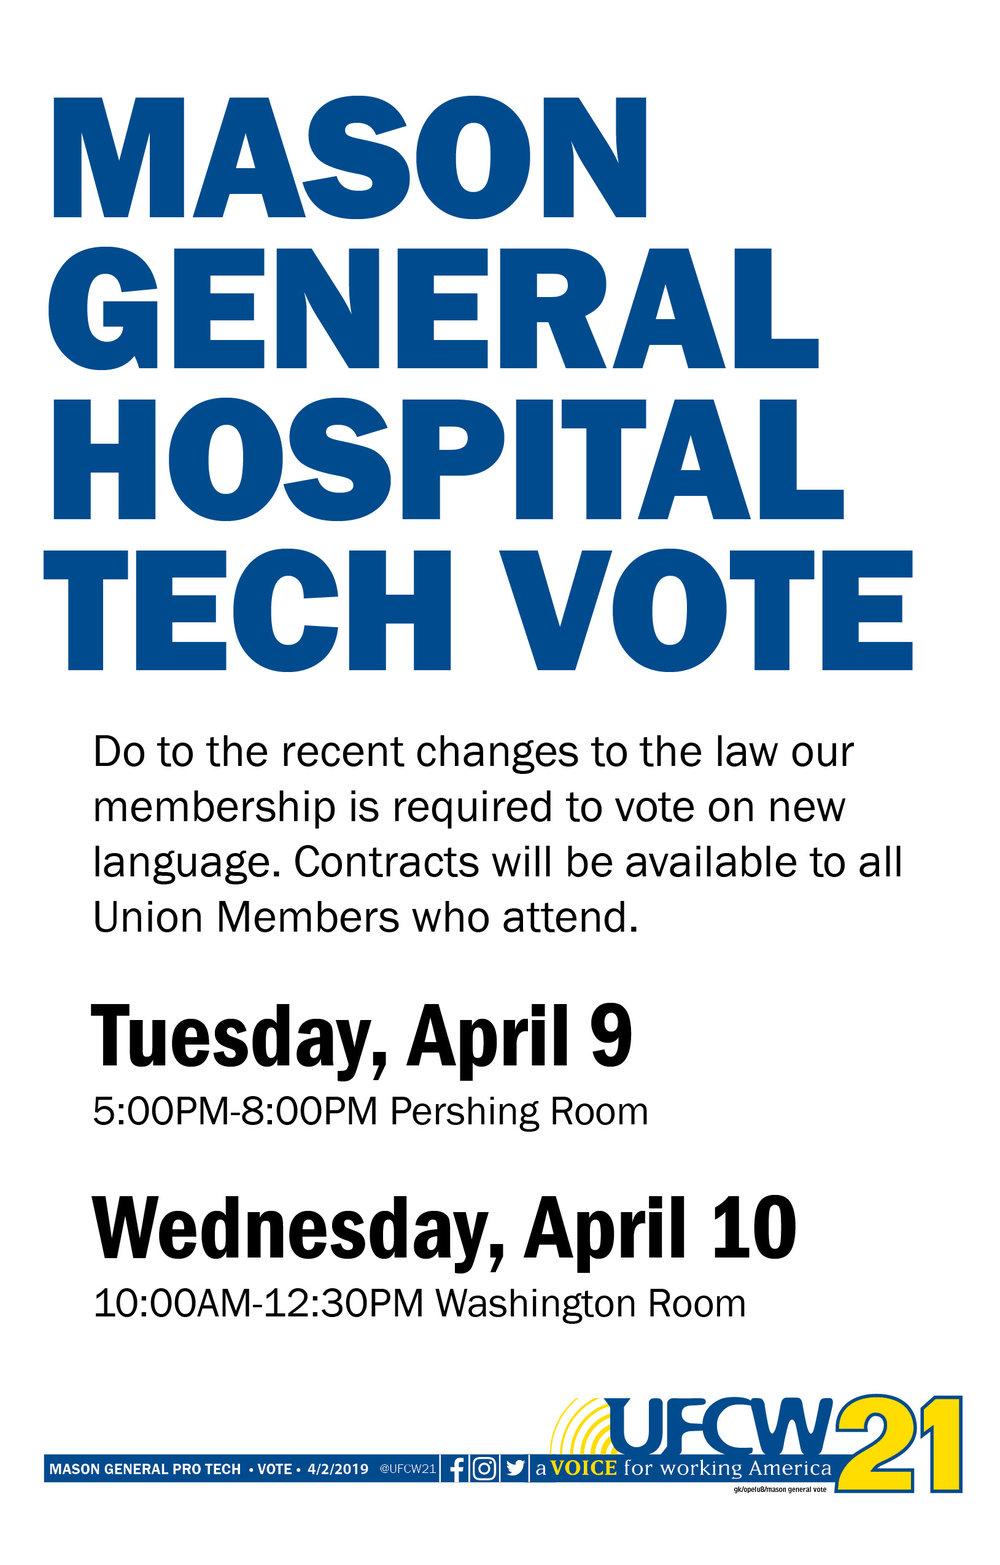 2019 0402 Mason General Vote.jpg